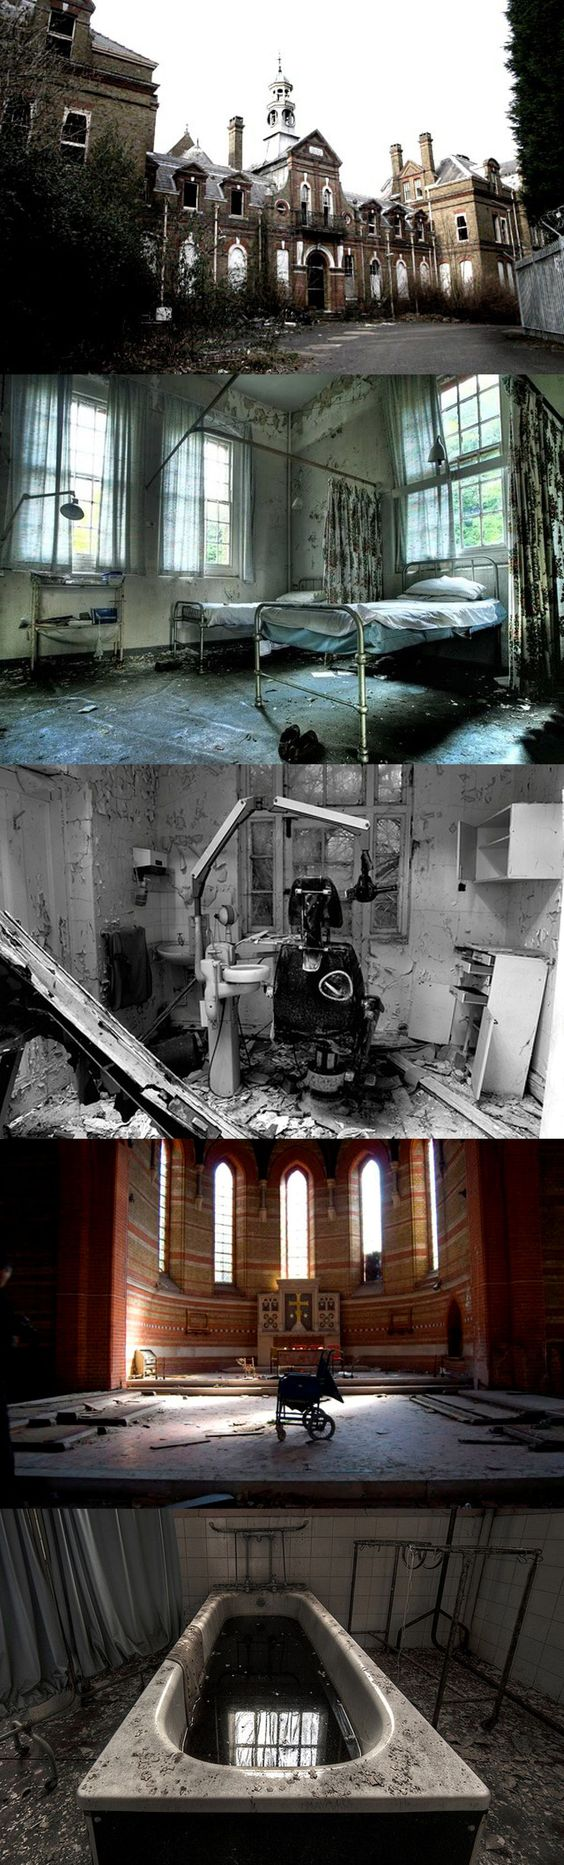 Cane Hill was an insane asylum in Croydon London in use until 1991